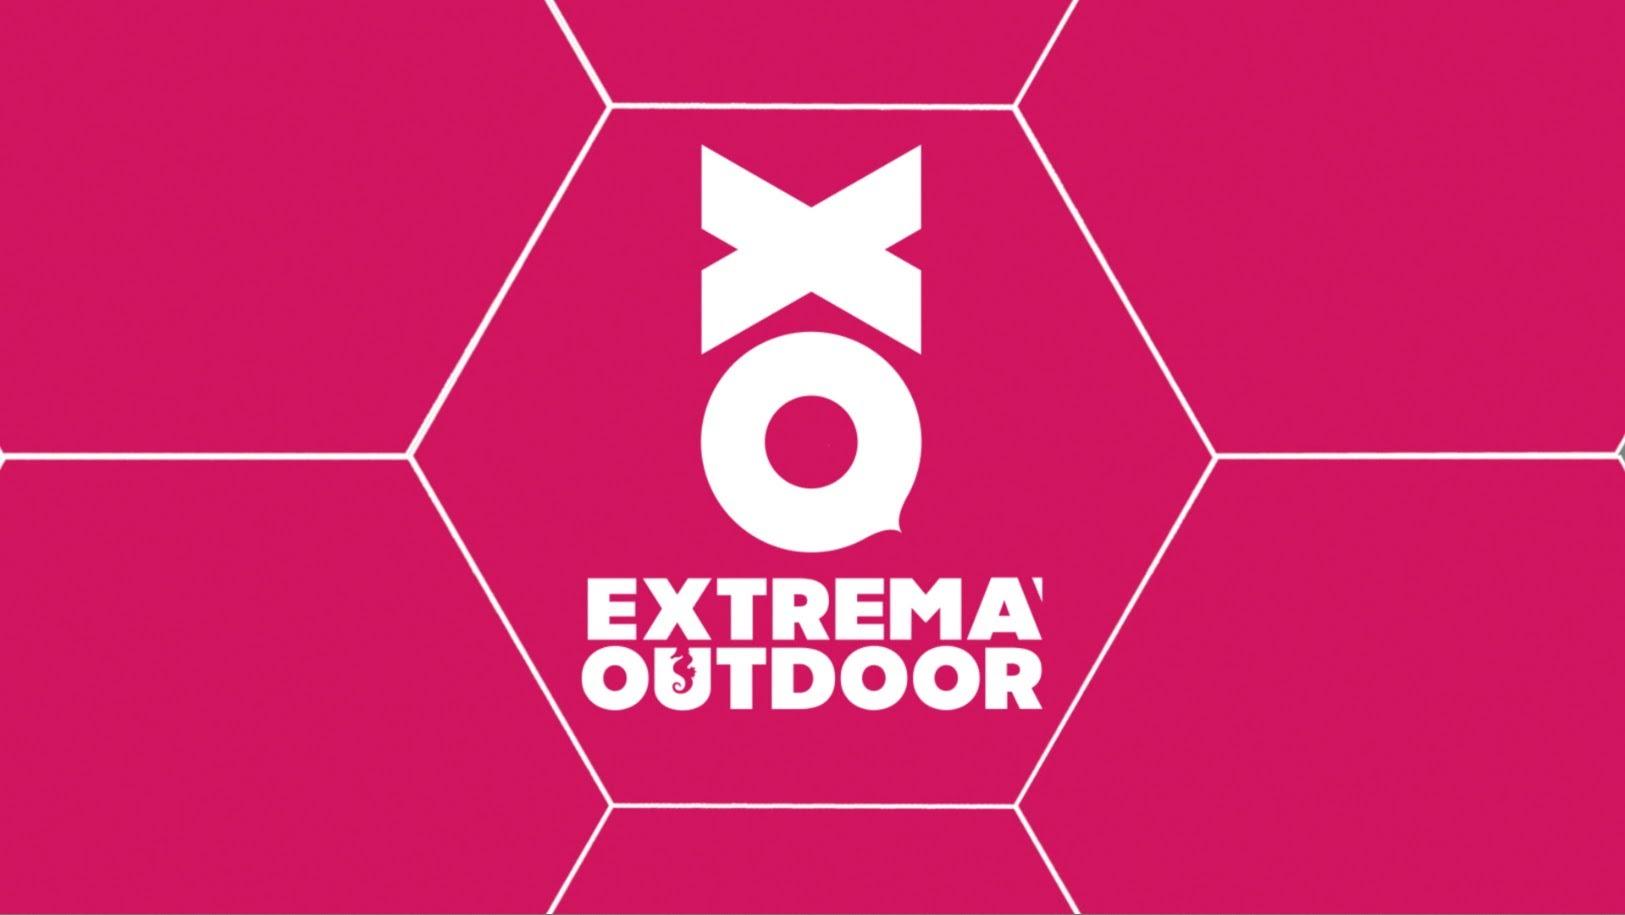 Extrema Outdoor 2012